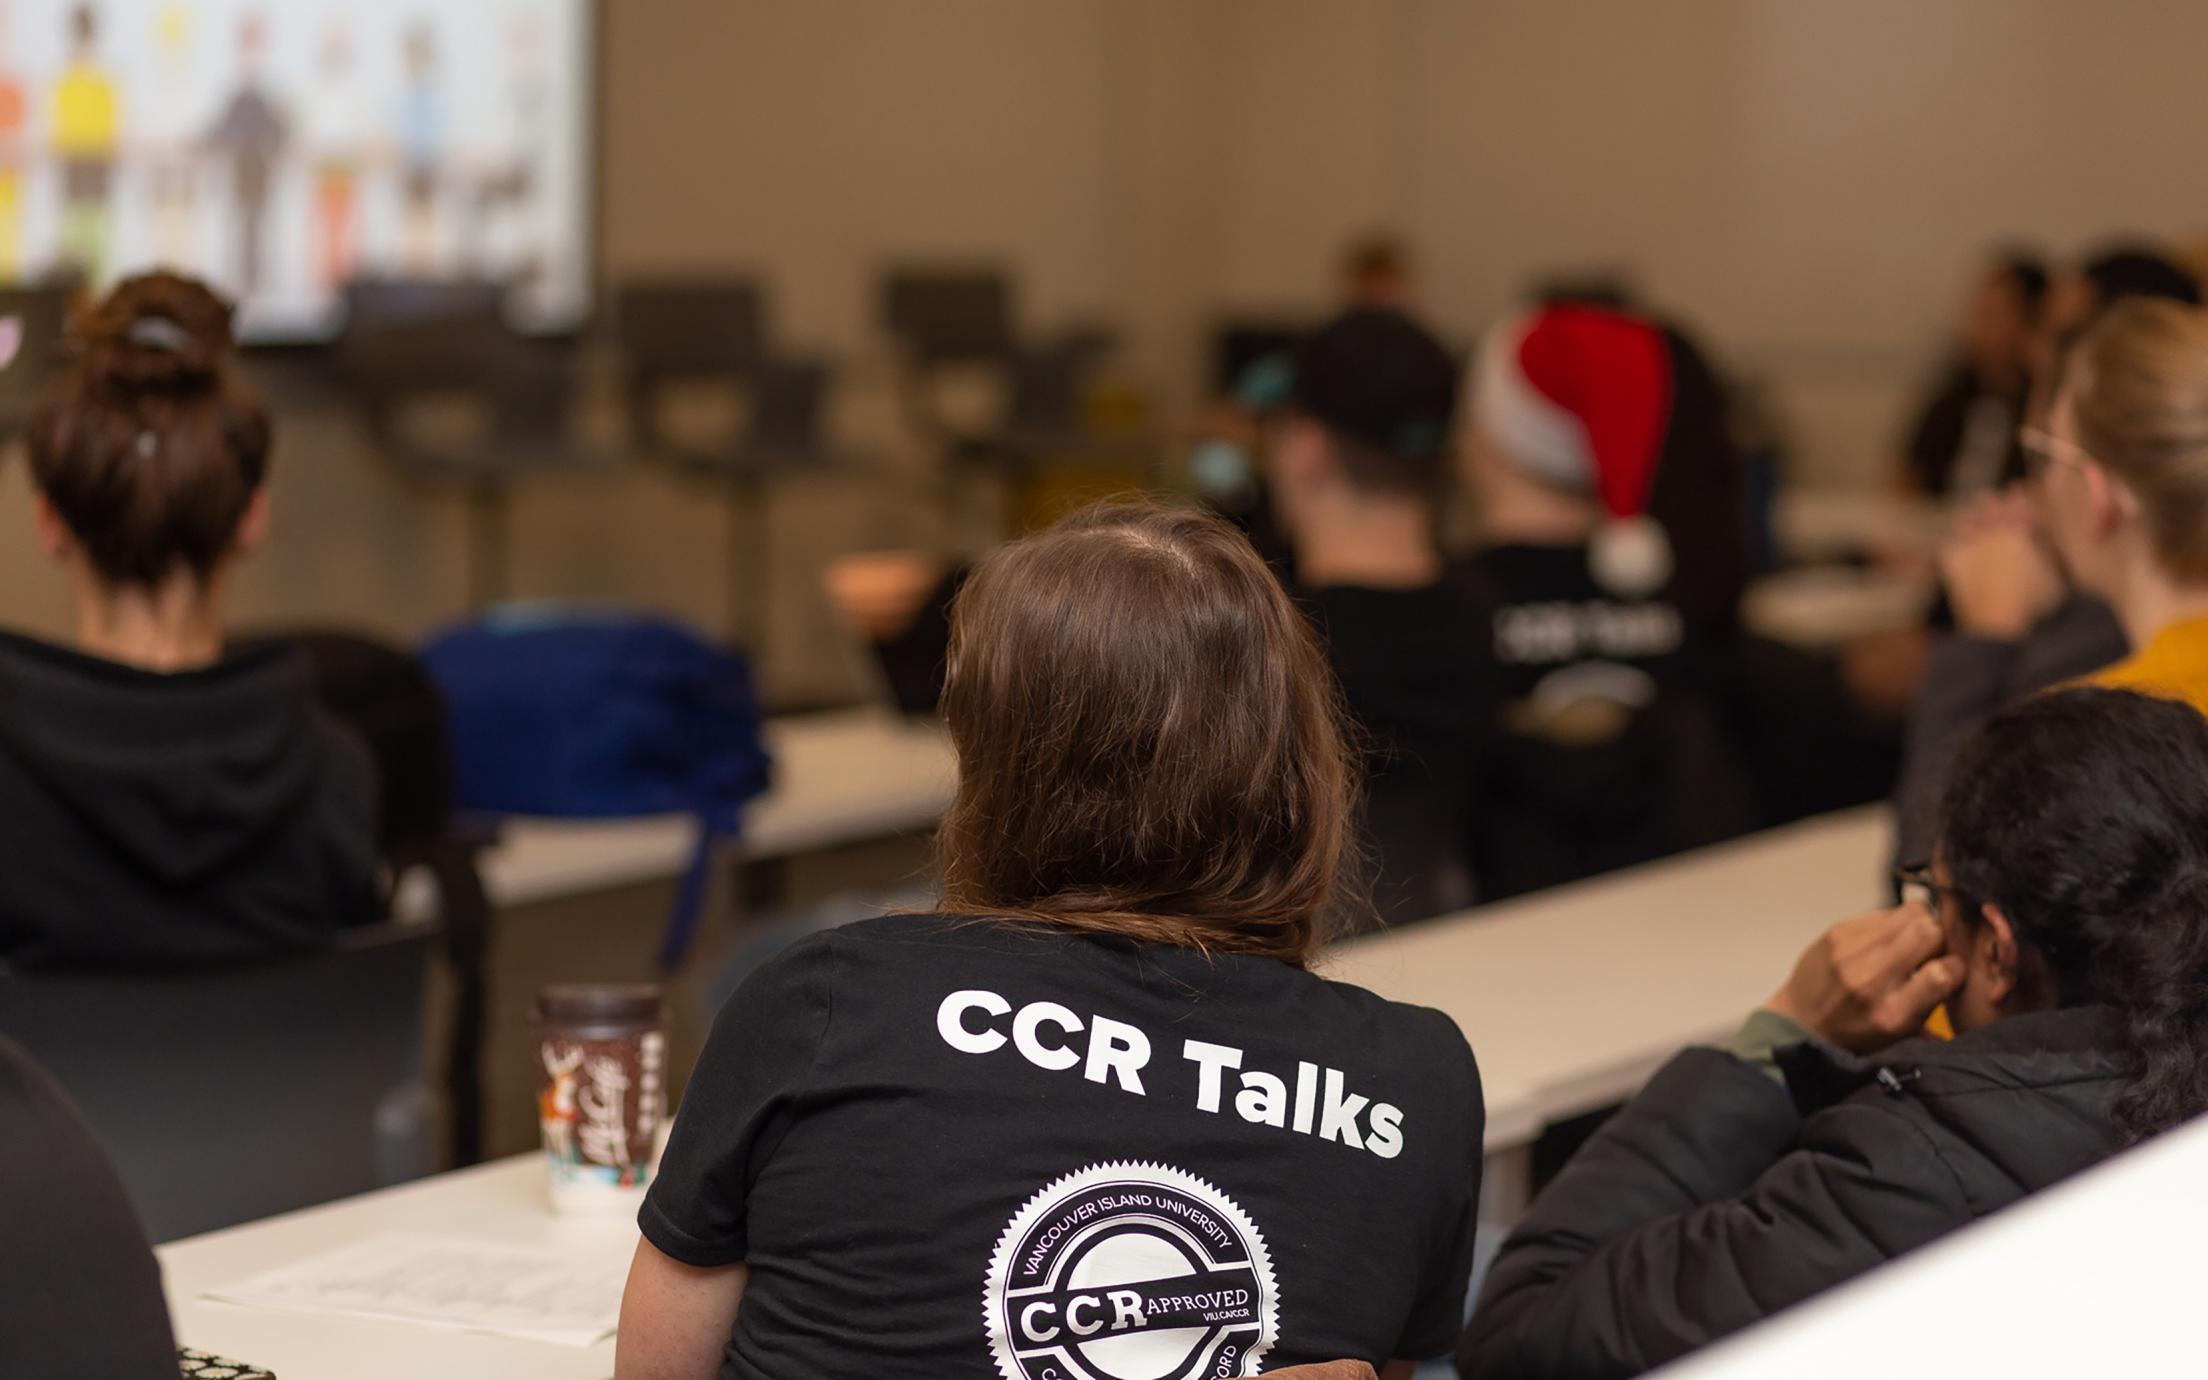 CCR Talks